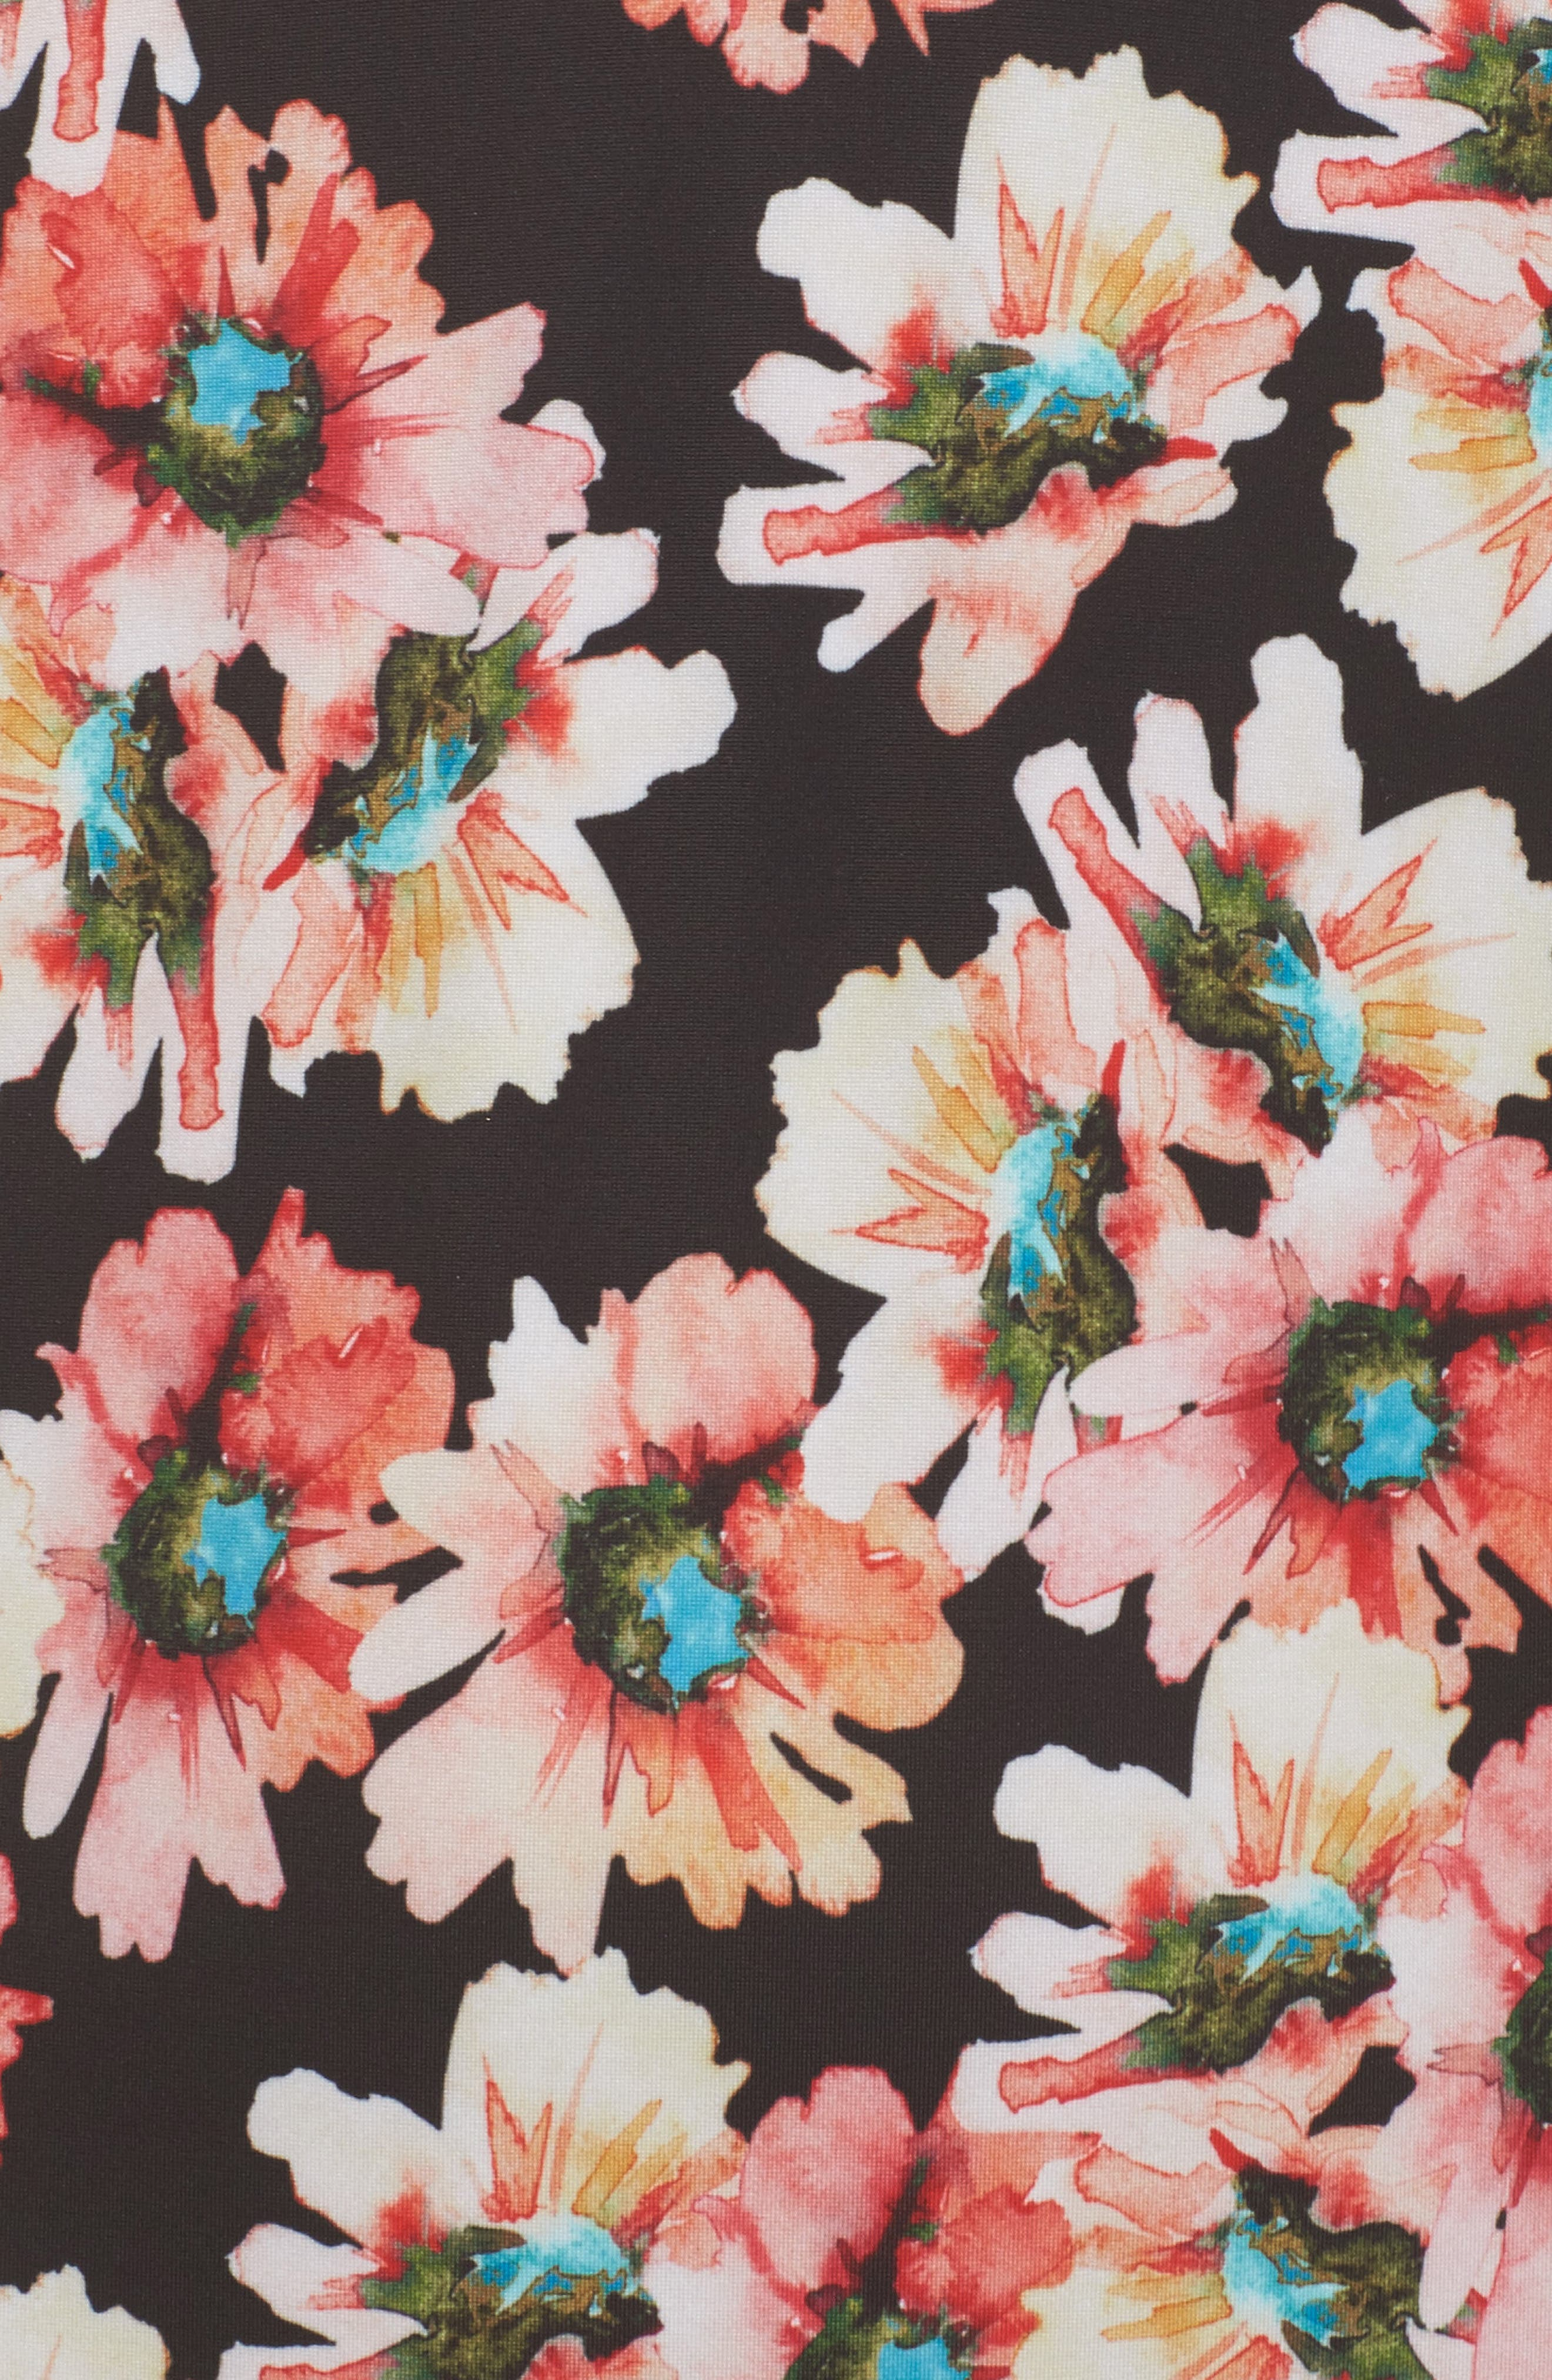 Flower Print One-Piece Swimsuit,                             Alternate thumbnail 5, color,                             958